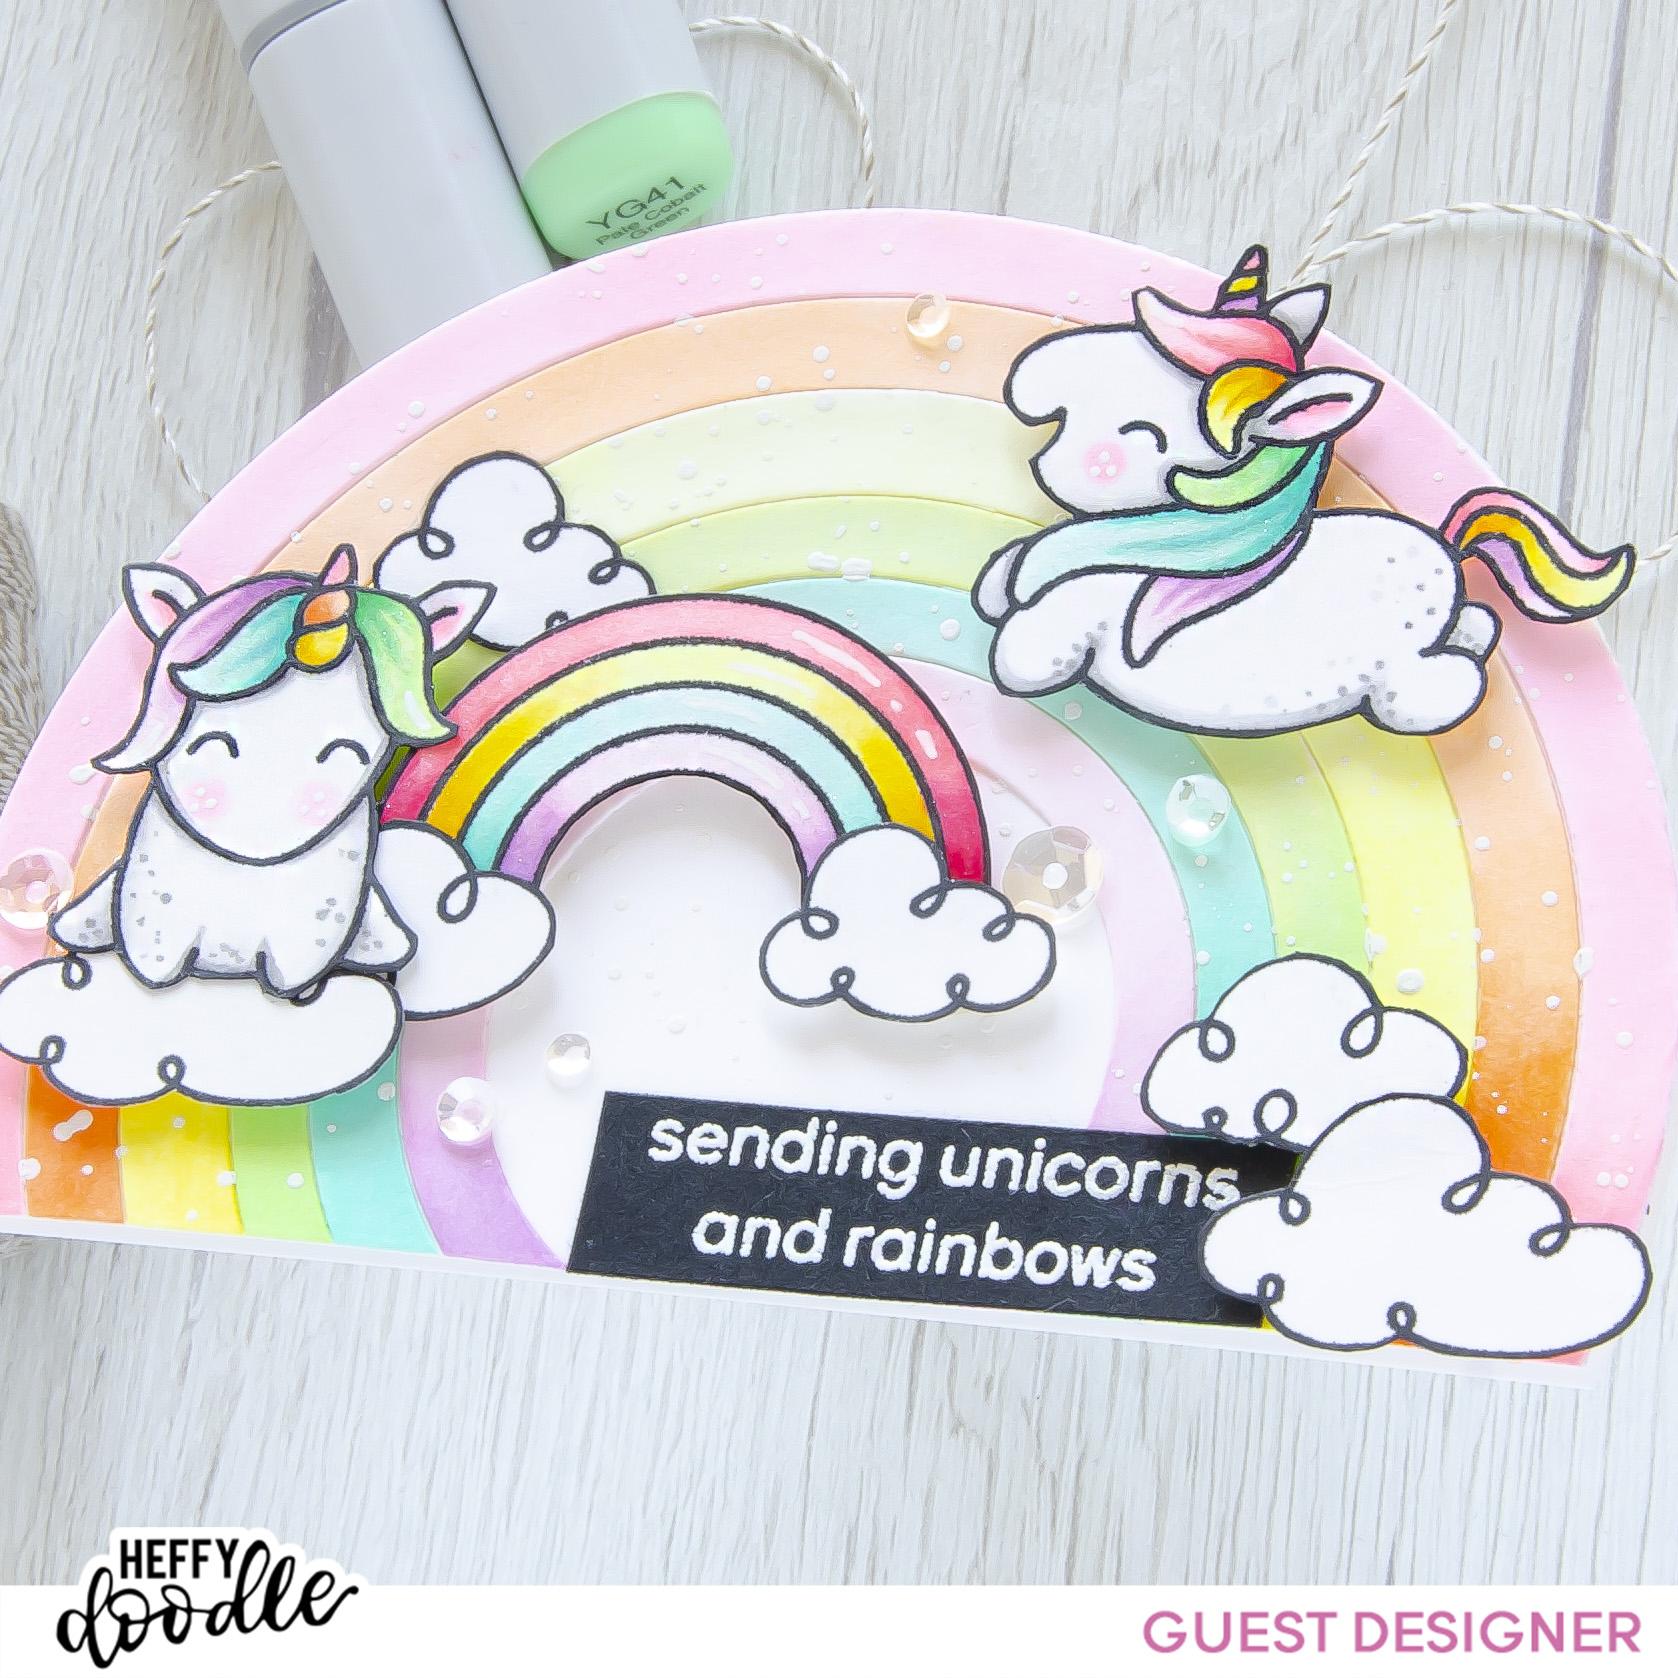 Sending Unicorns and Rainbows #handmade card by Tatiana Trafimovich #tatianacraftandart - Fluffy Puffy Unicorns stamp set by Heffy Doodle #heffydoodle